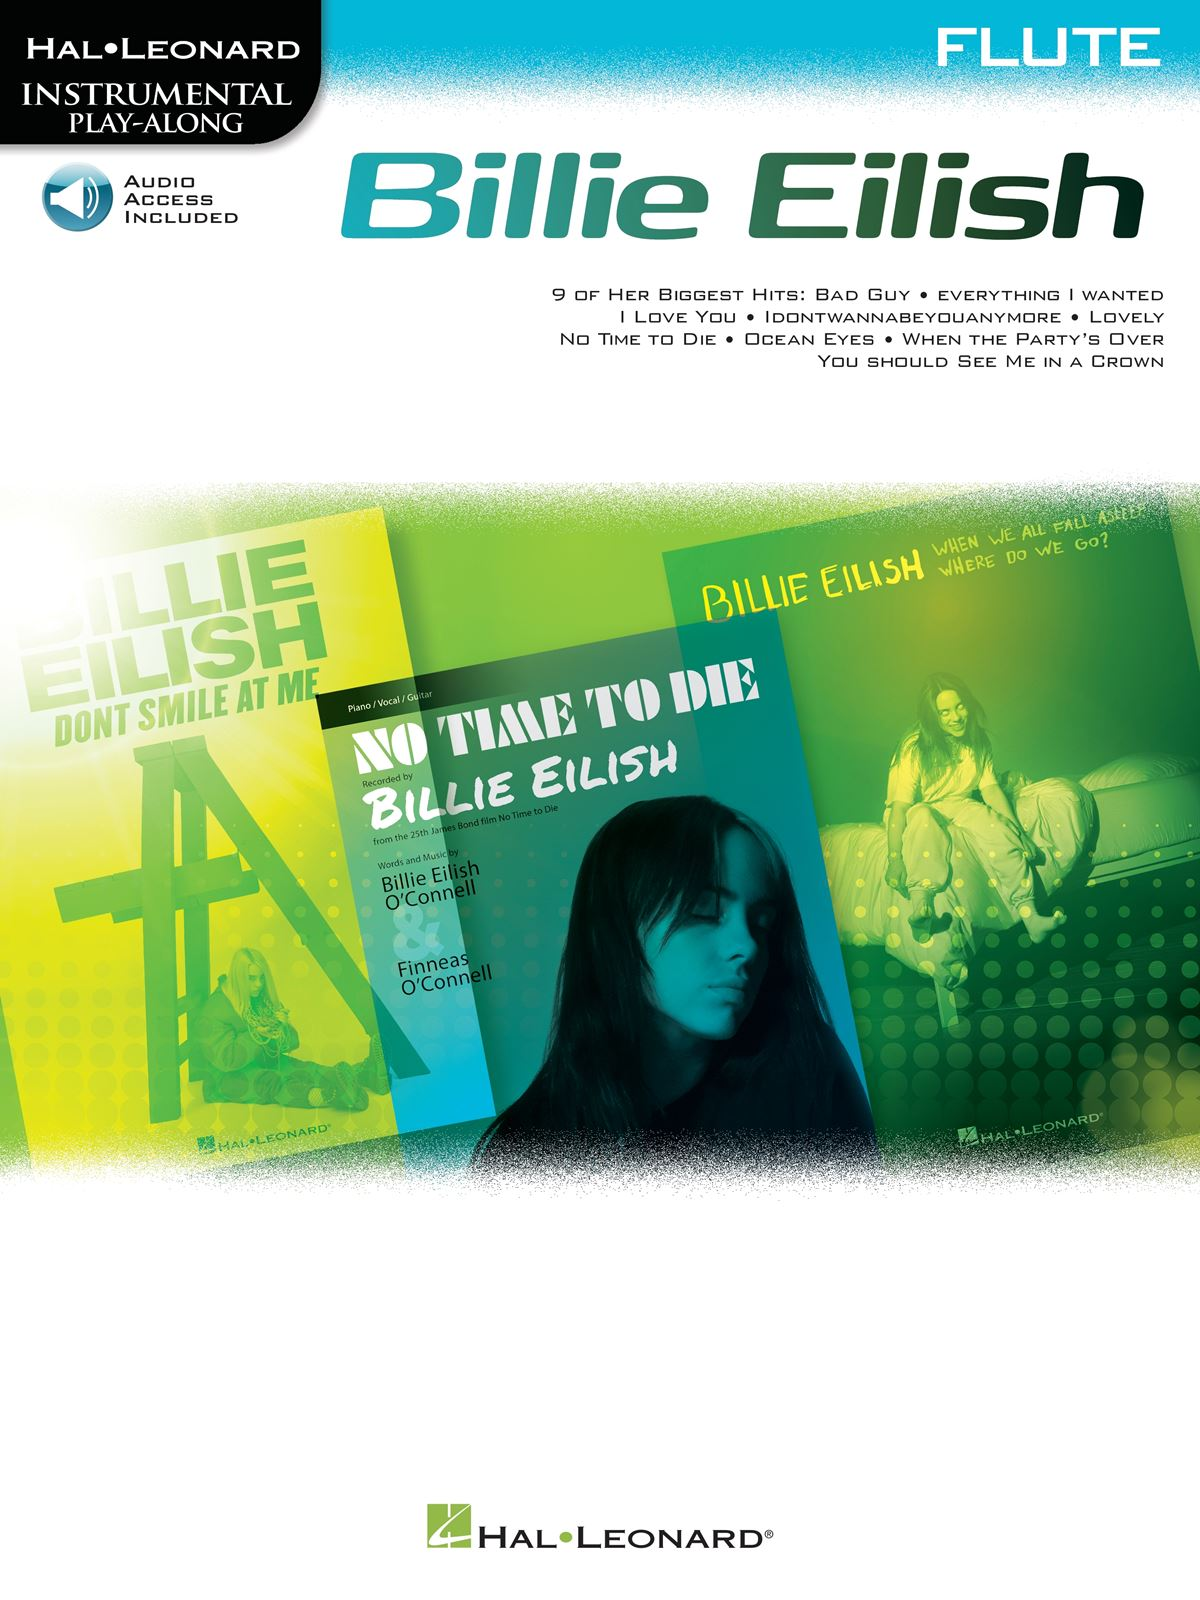 Billie Eilish: Billie Eilish For Flute: Flute Solo: Instrumental Collection